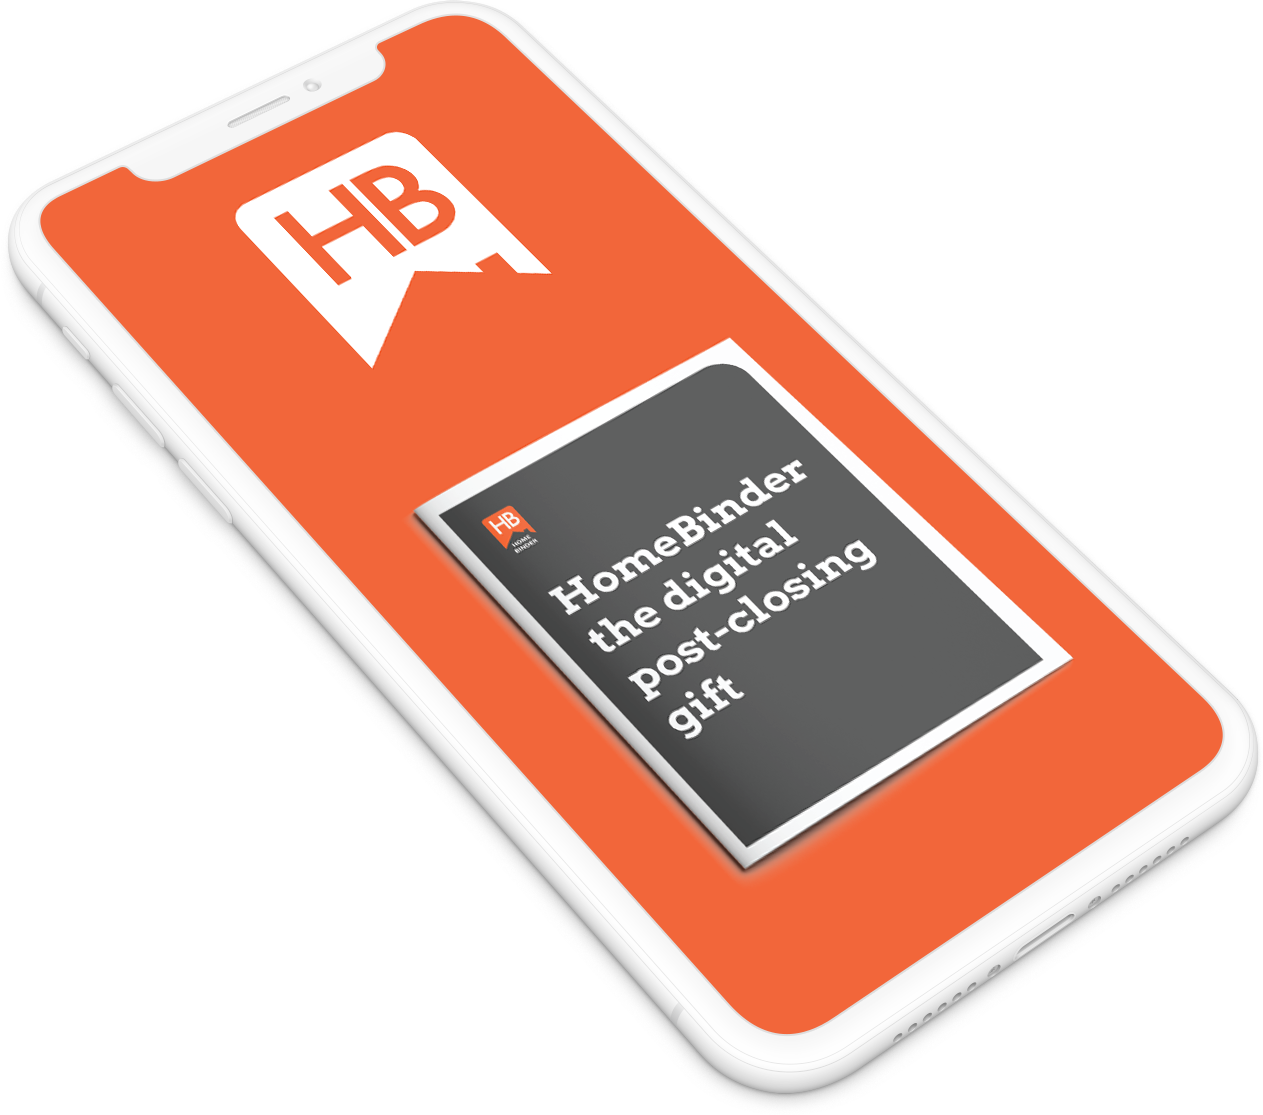 iPhone-Mockup_HB_Article2